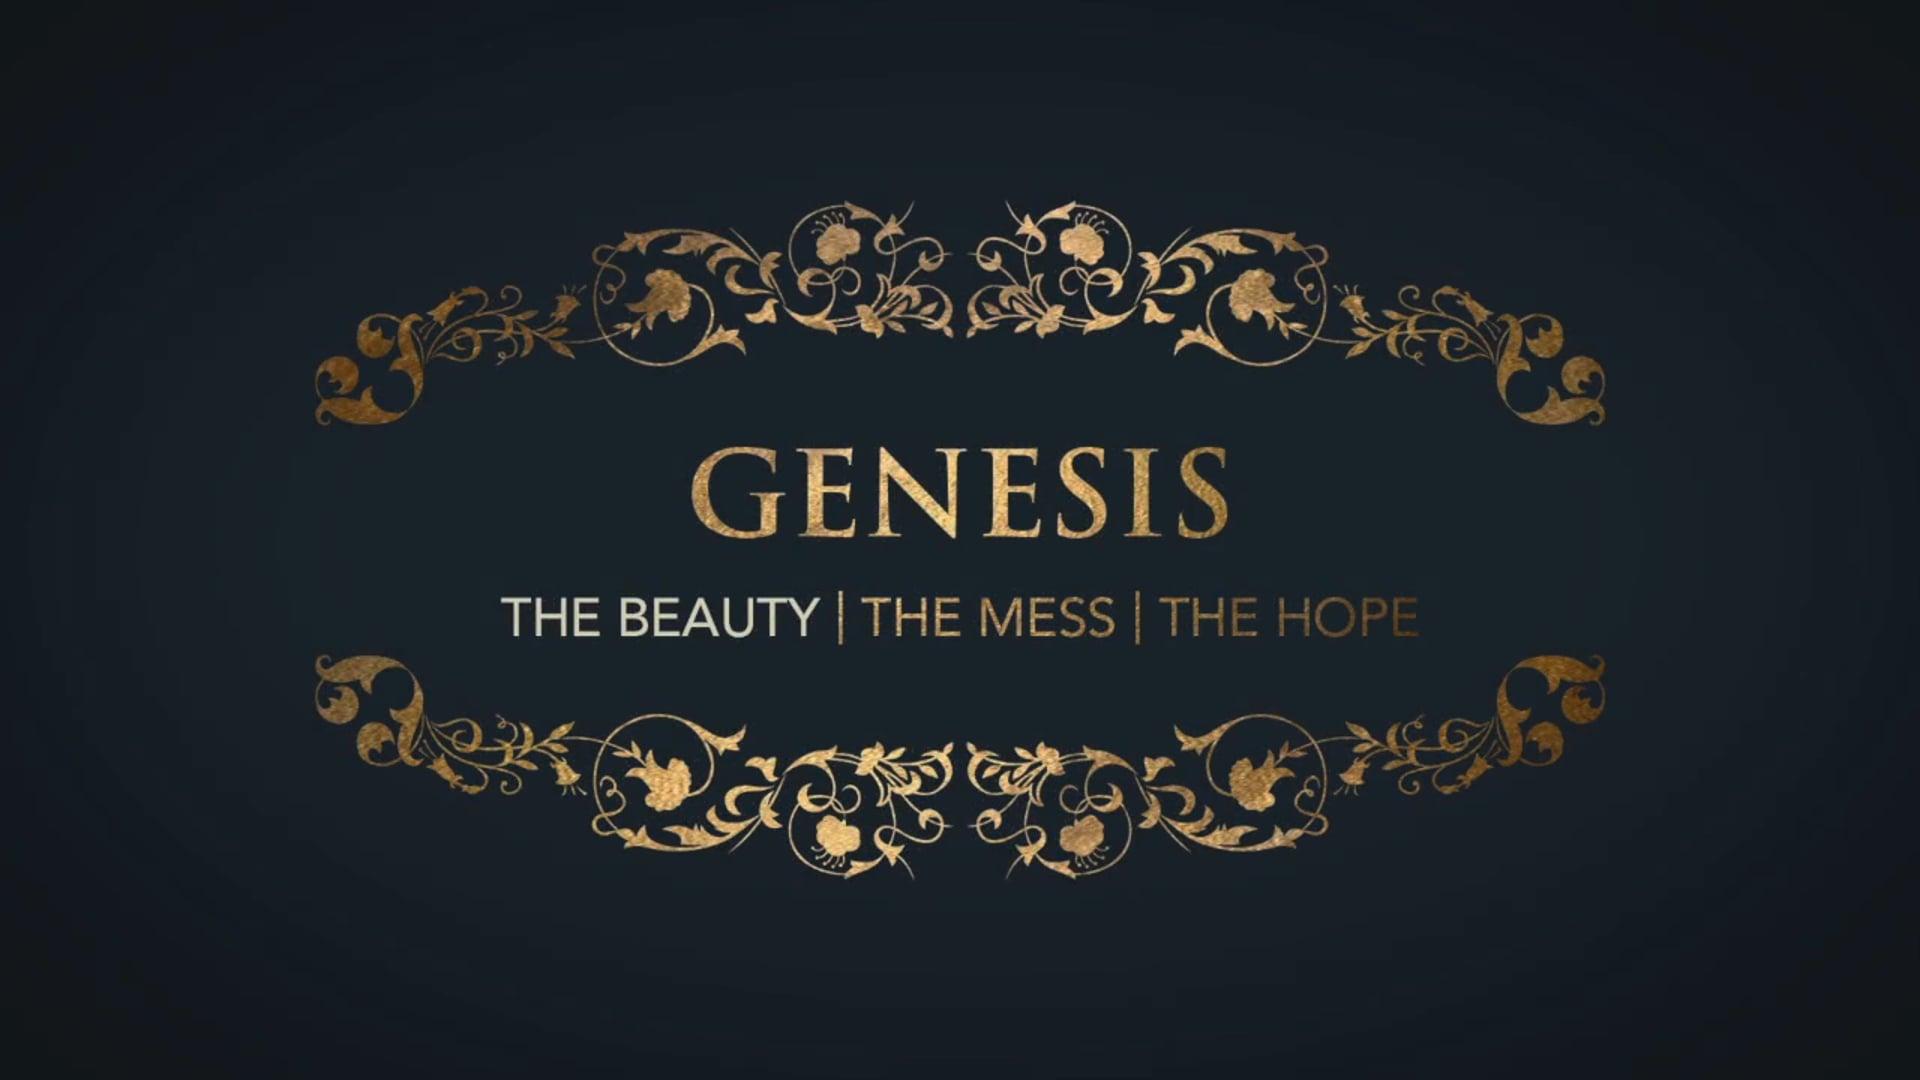 Week 2: The Beauty of God